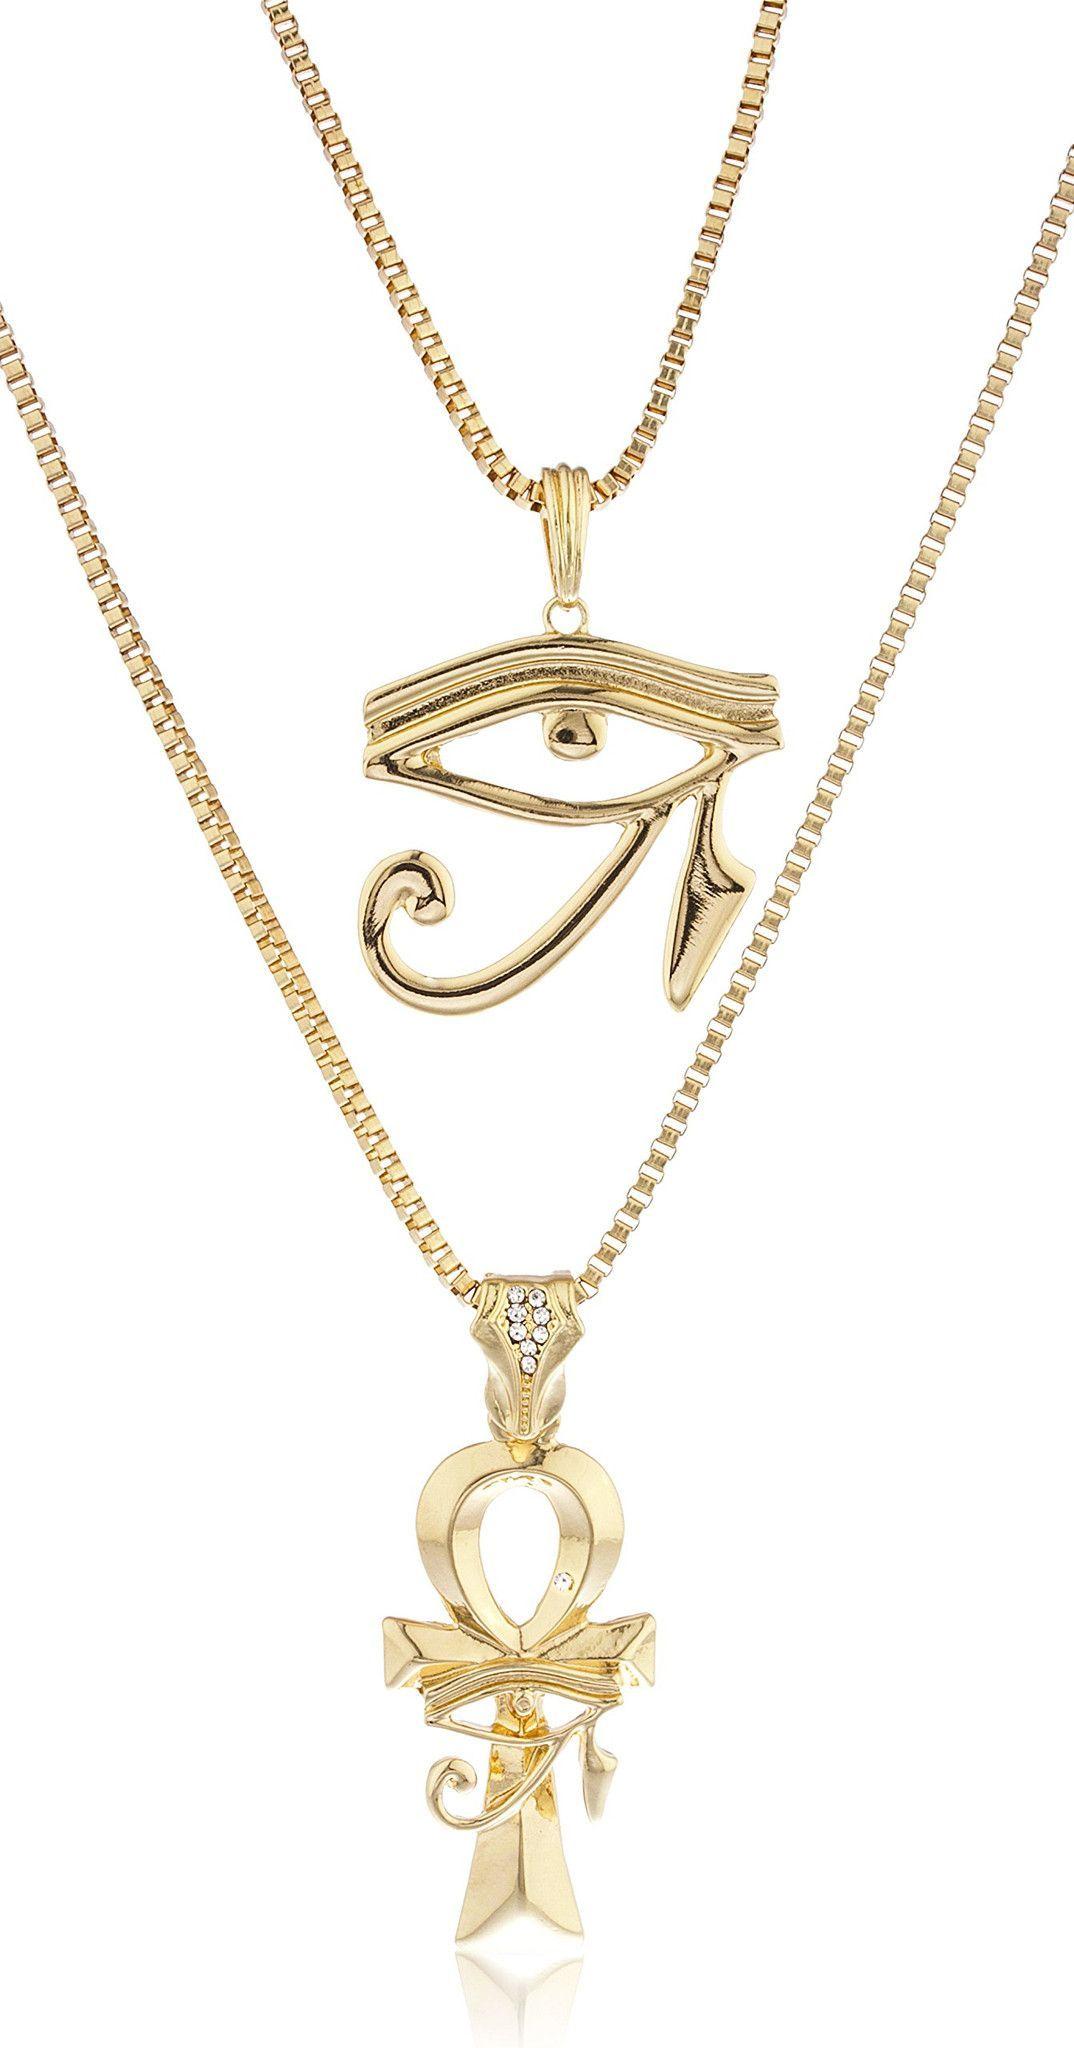 14K White Gold Over Eye of Horus Magical Fashion Pendant Necklace